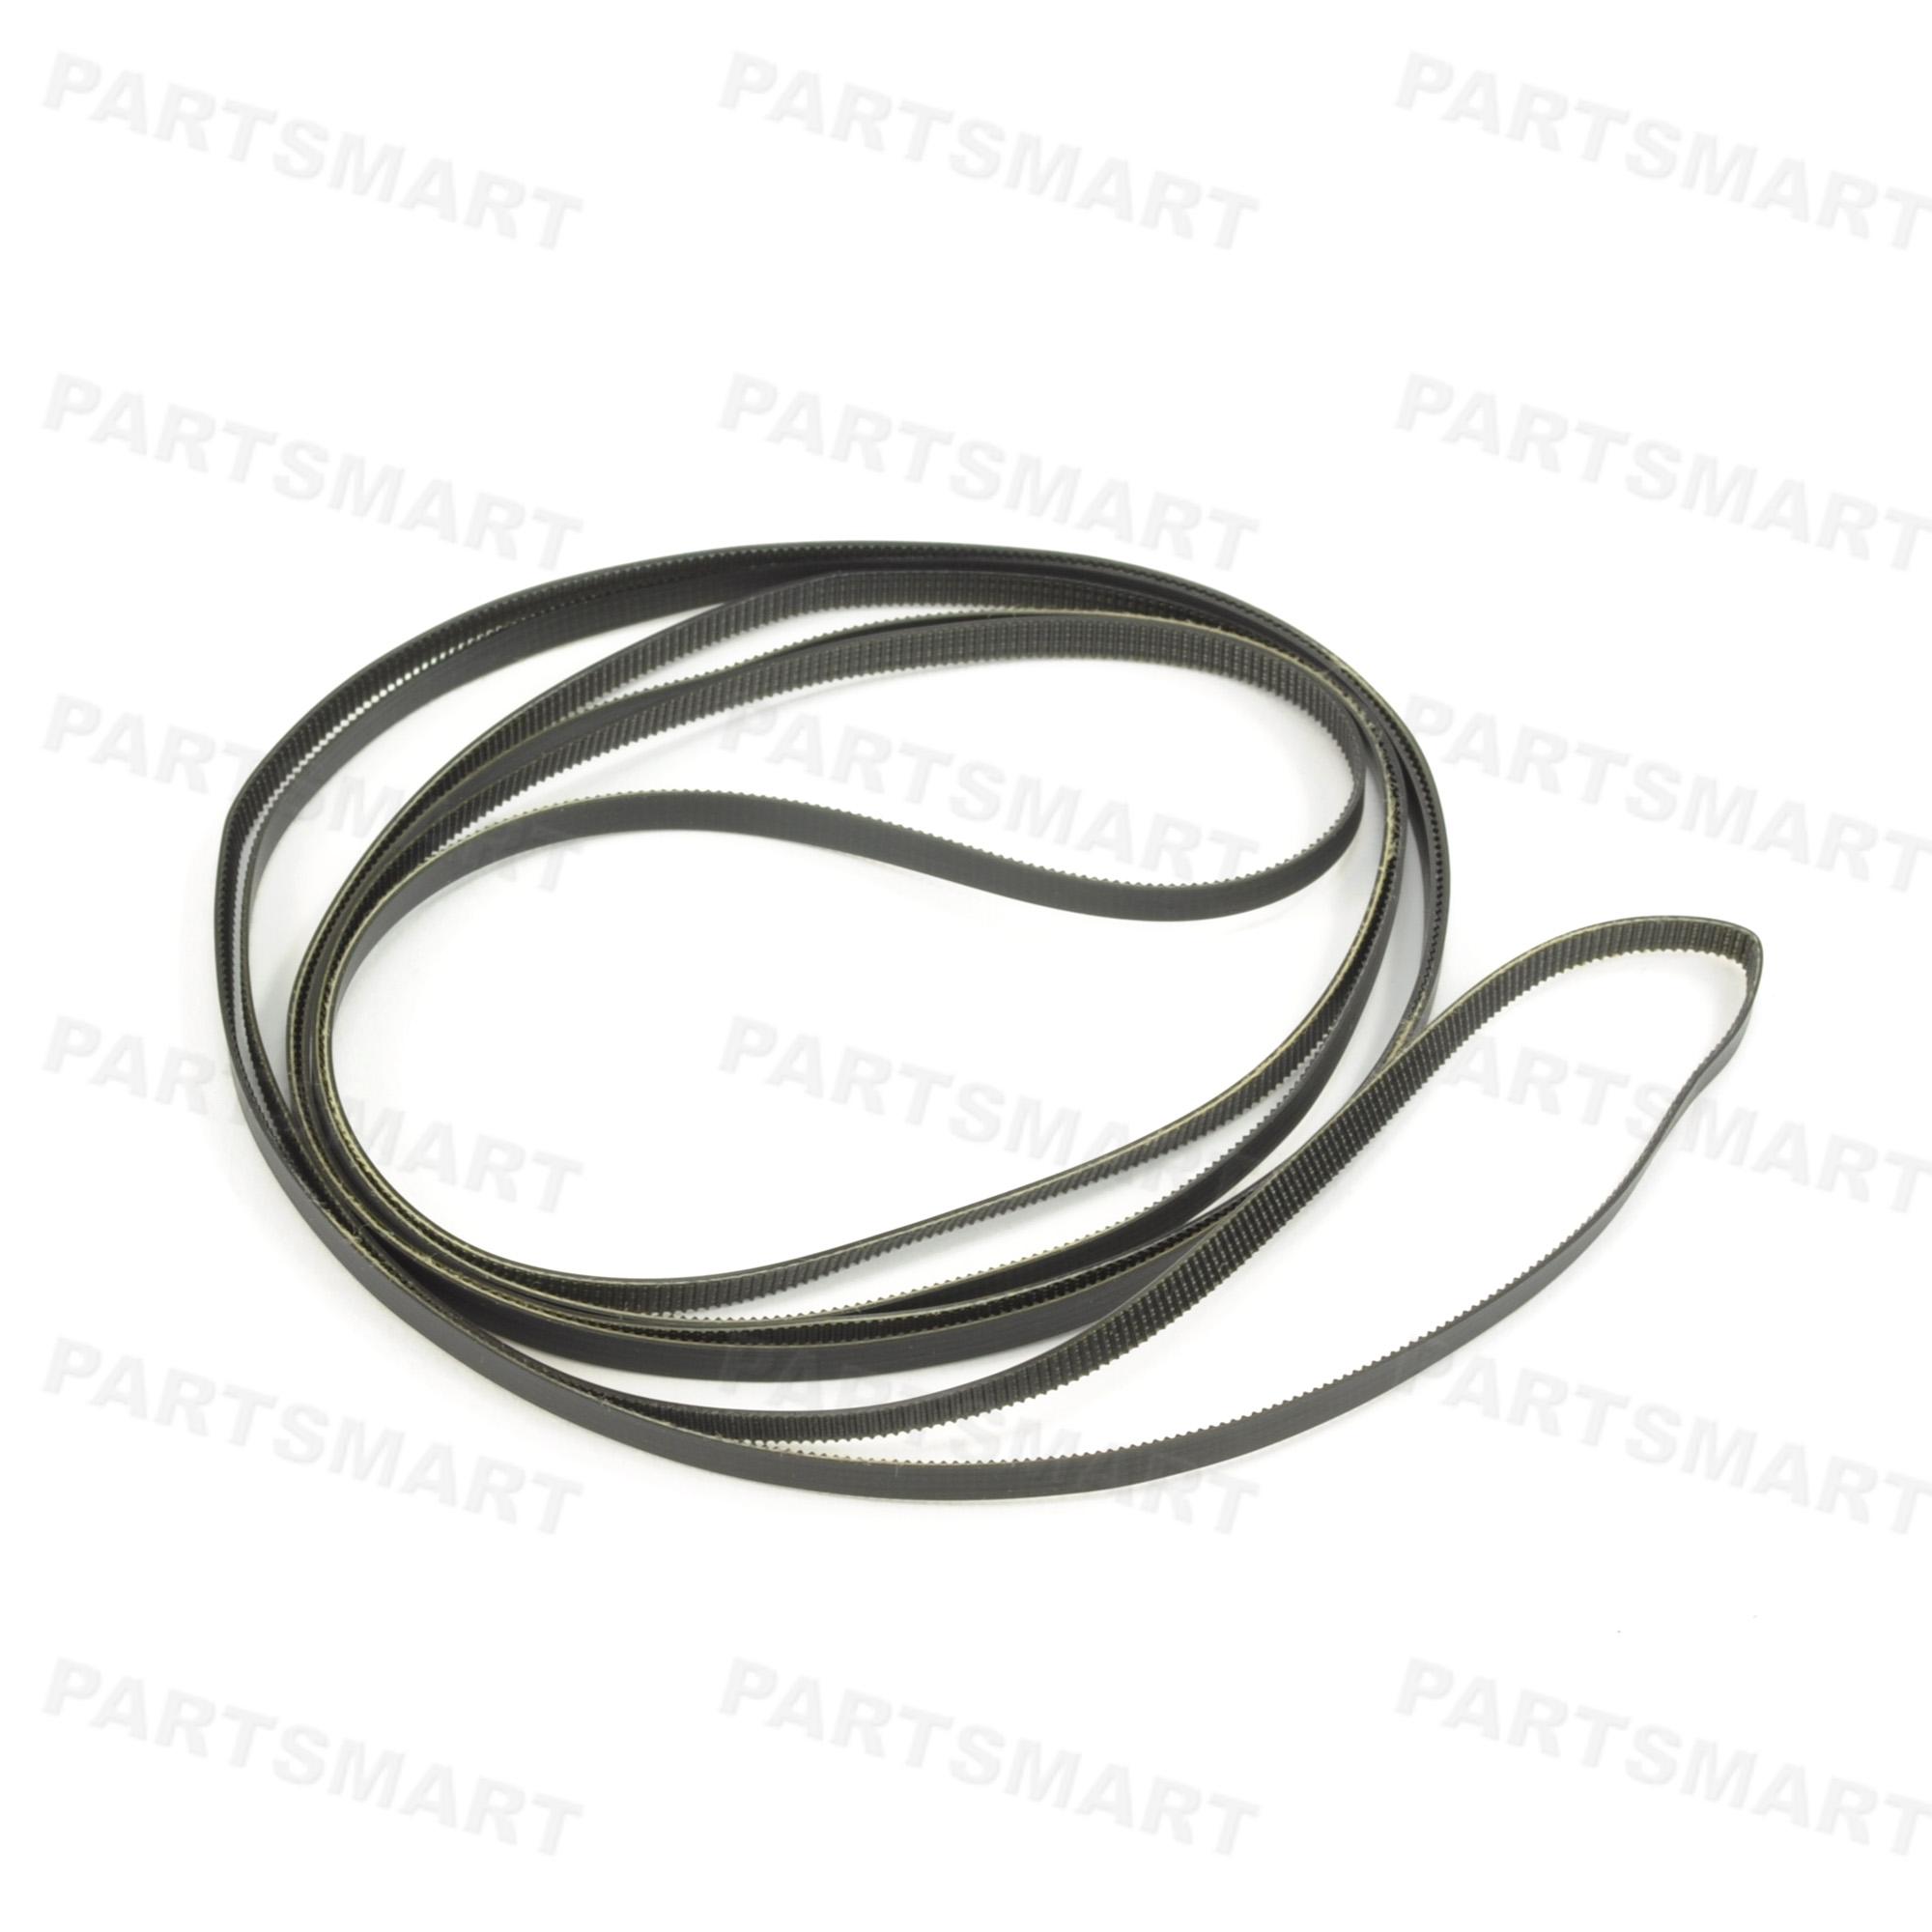 HP Designjet 100 Plotter Parts | Partsmart